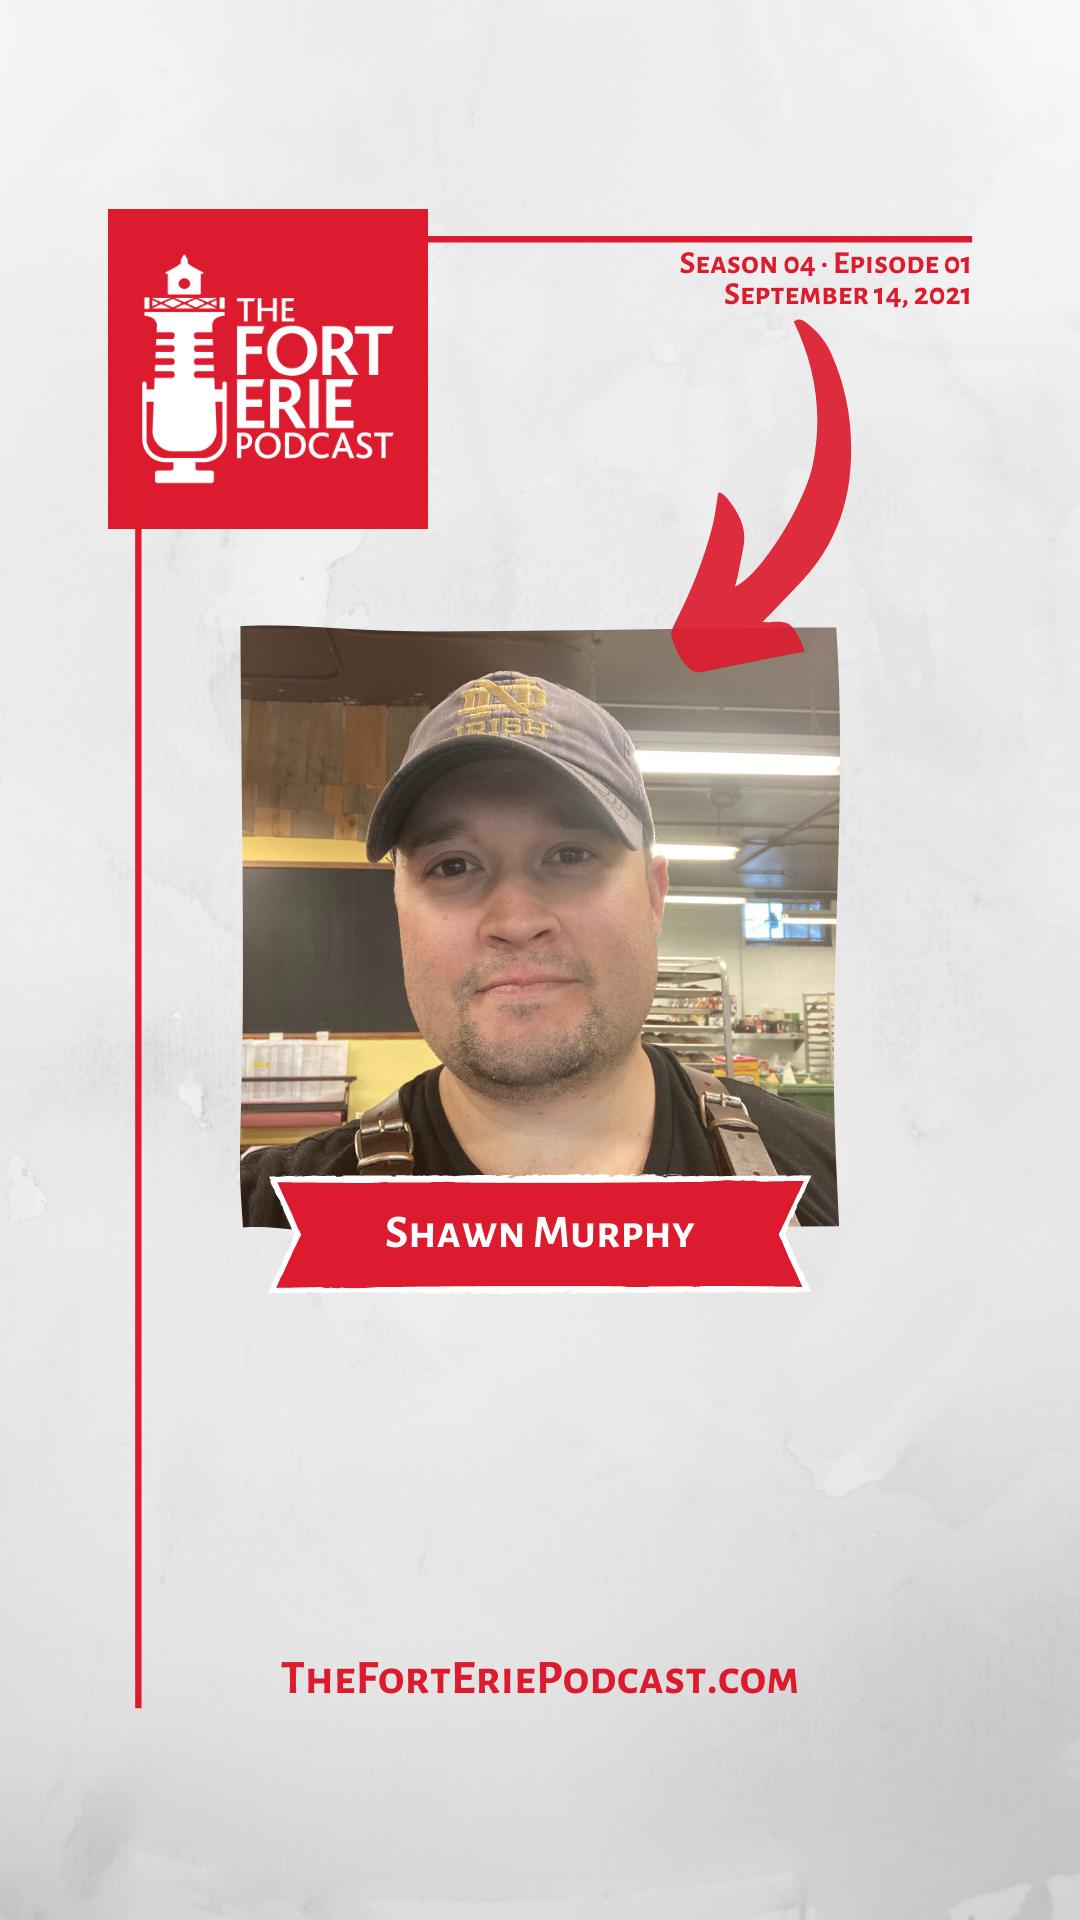 S04E01 – Shawn Murphy, Your Farm Gate